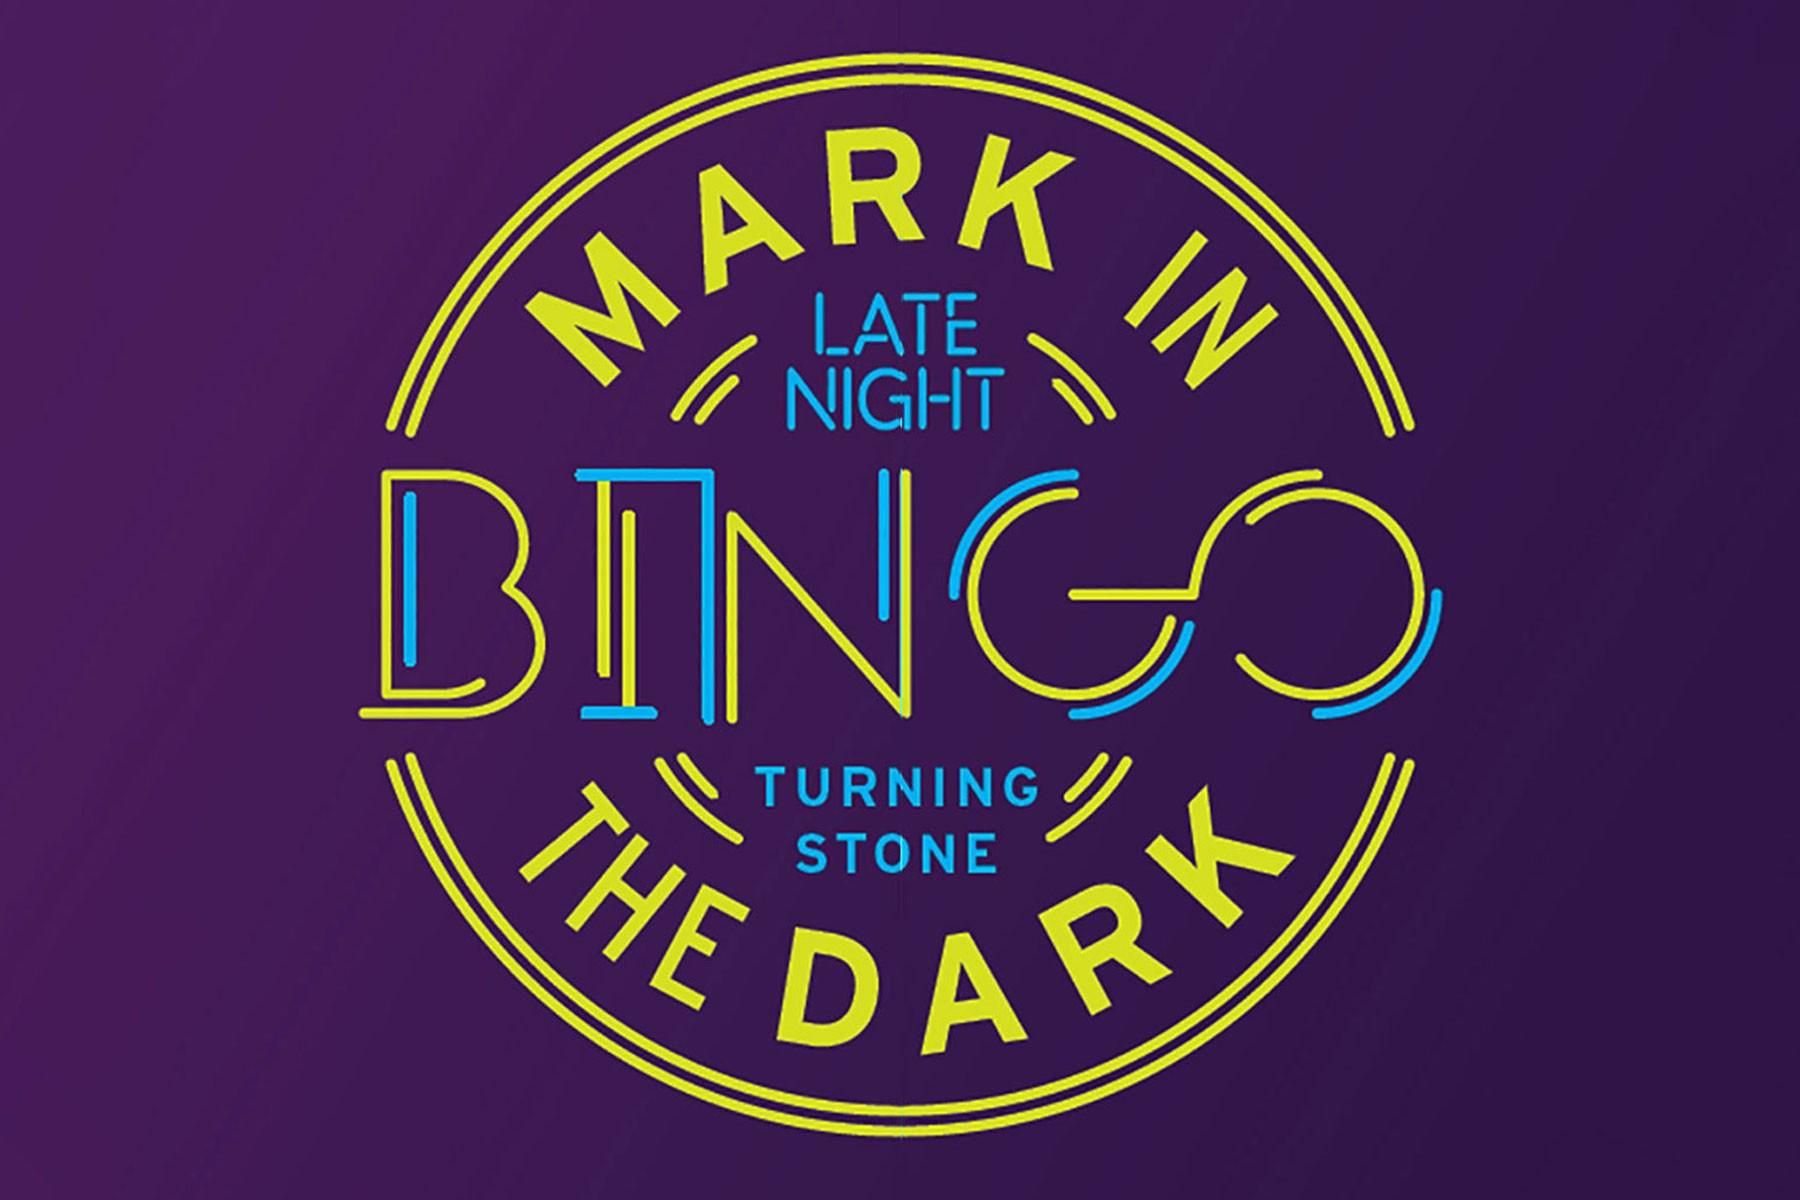 Casino Promotions | Turning Stone Resort Casino Regarding Bingo Schedule For Turning Stone For Today